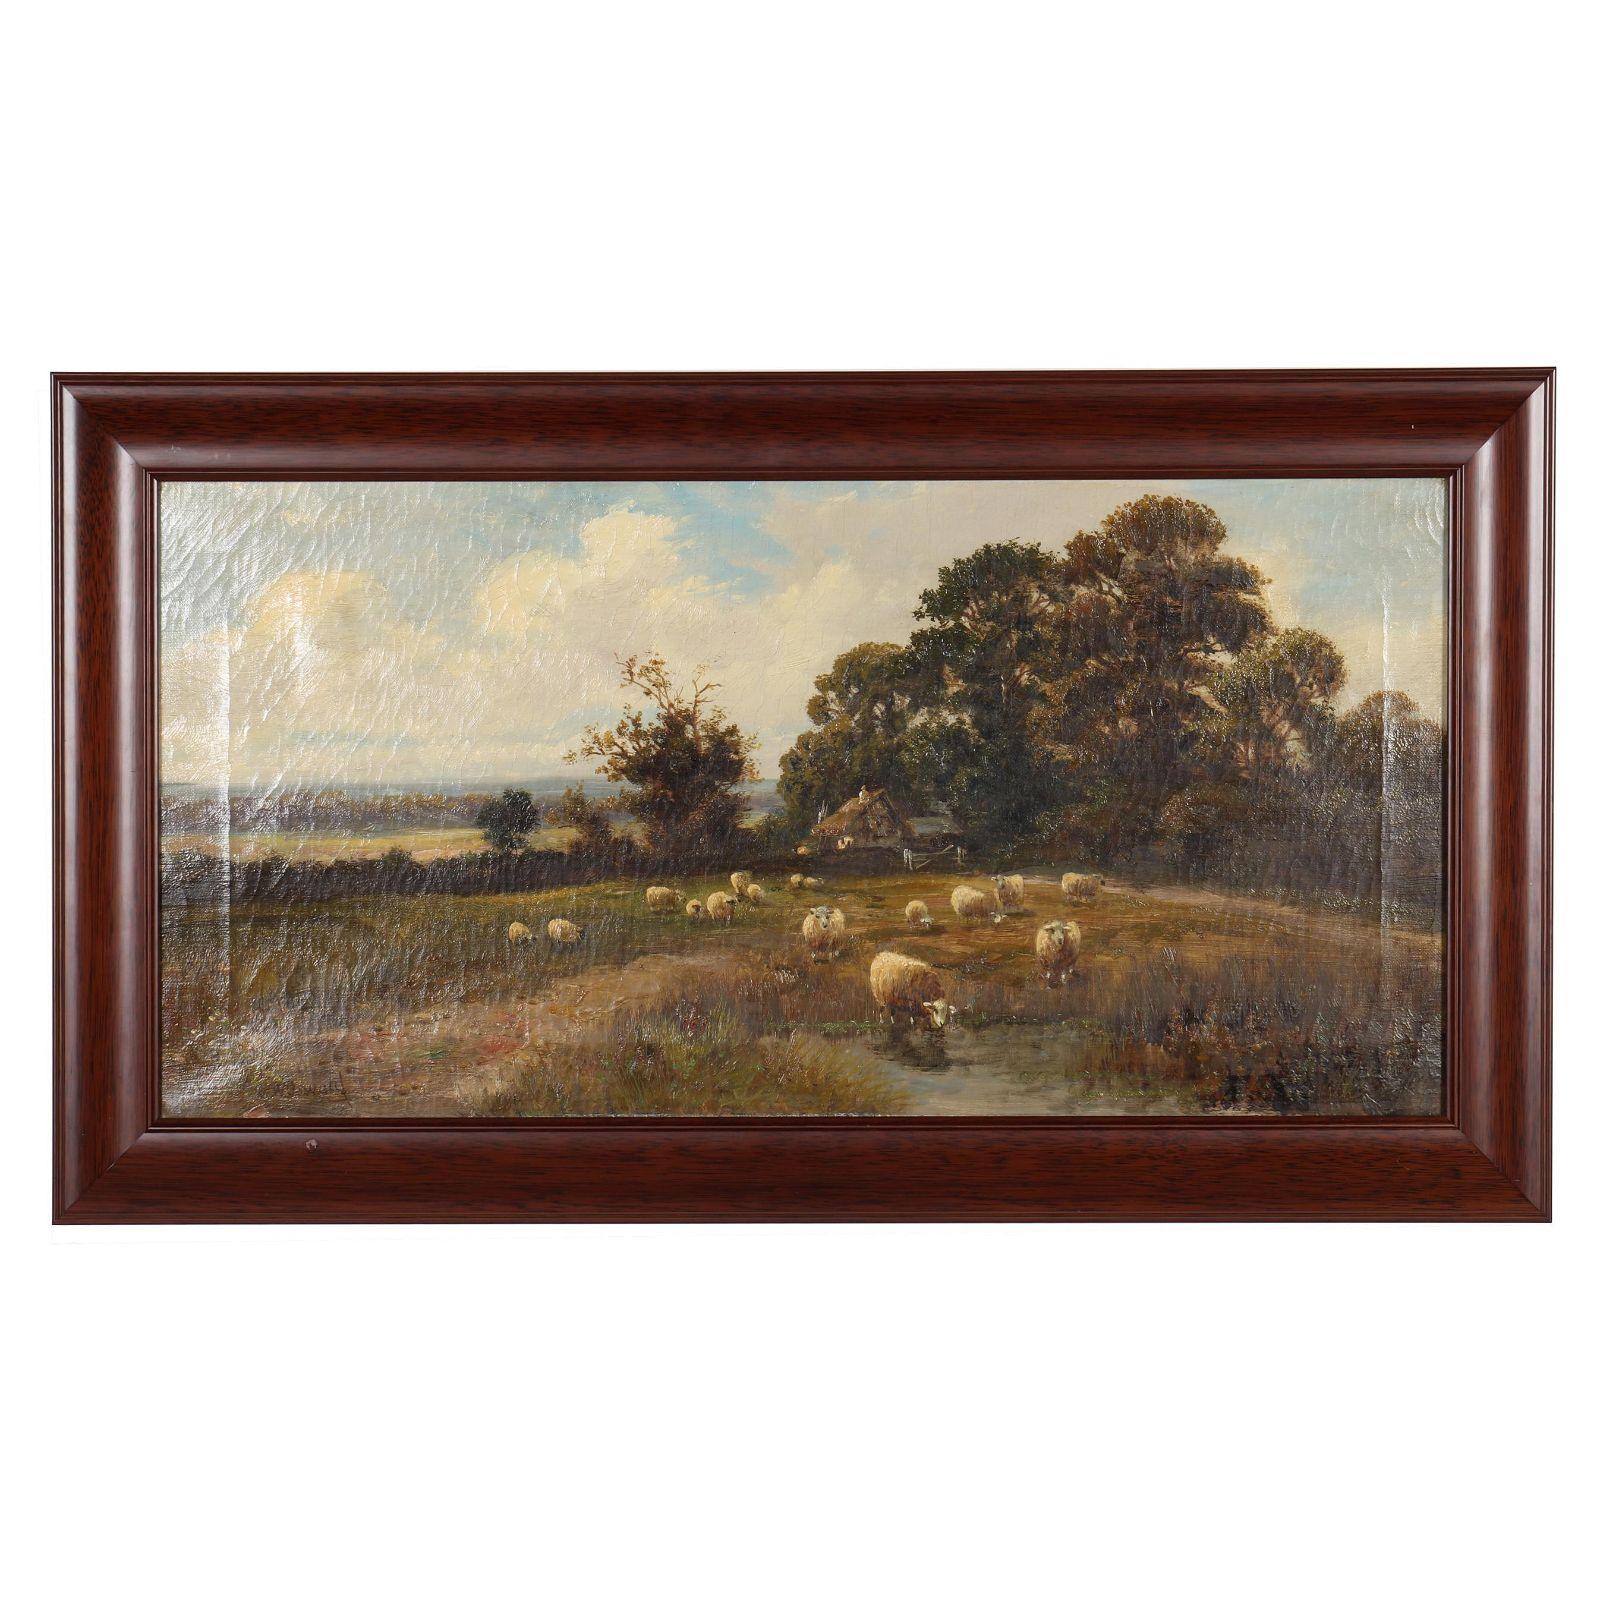 Charles W. Oswald (British, fl. 1892-1900), Landscape